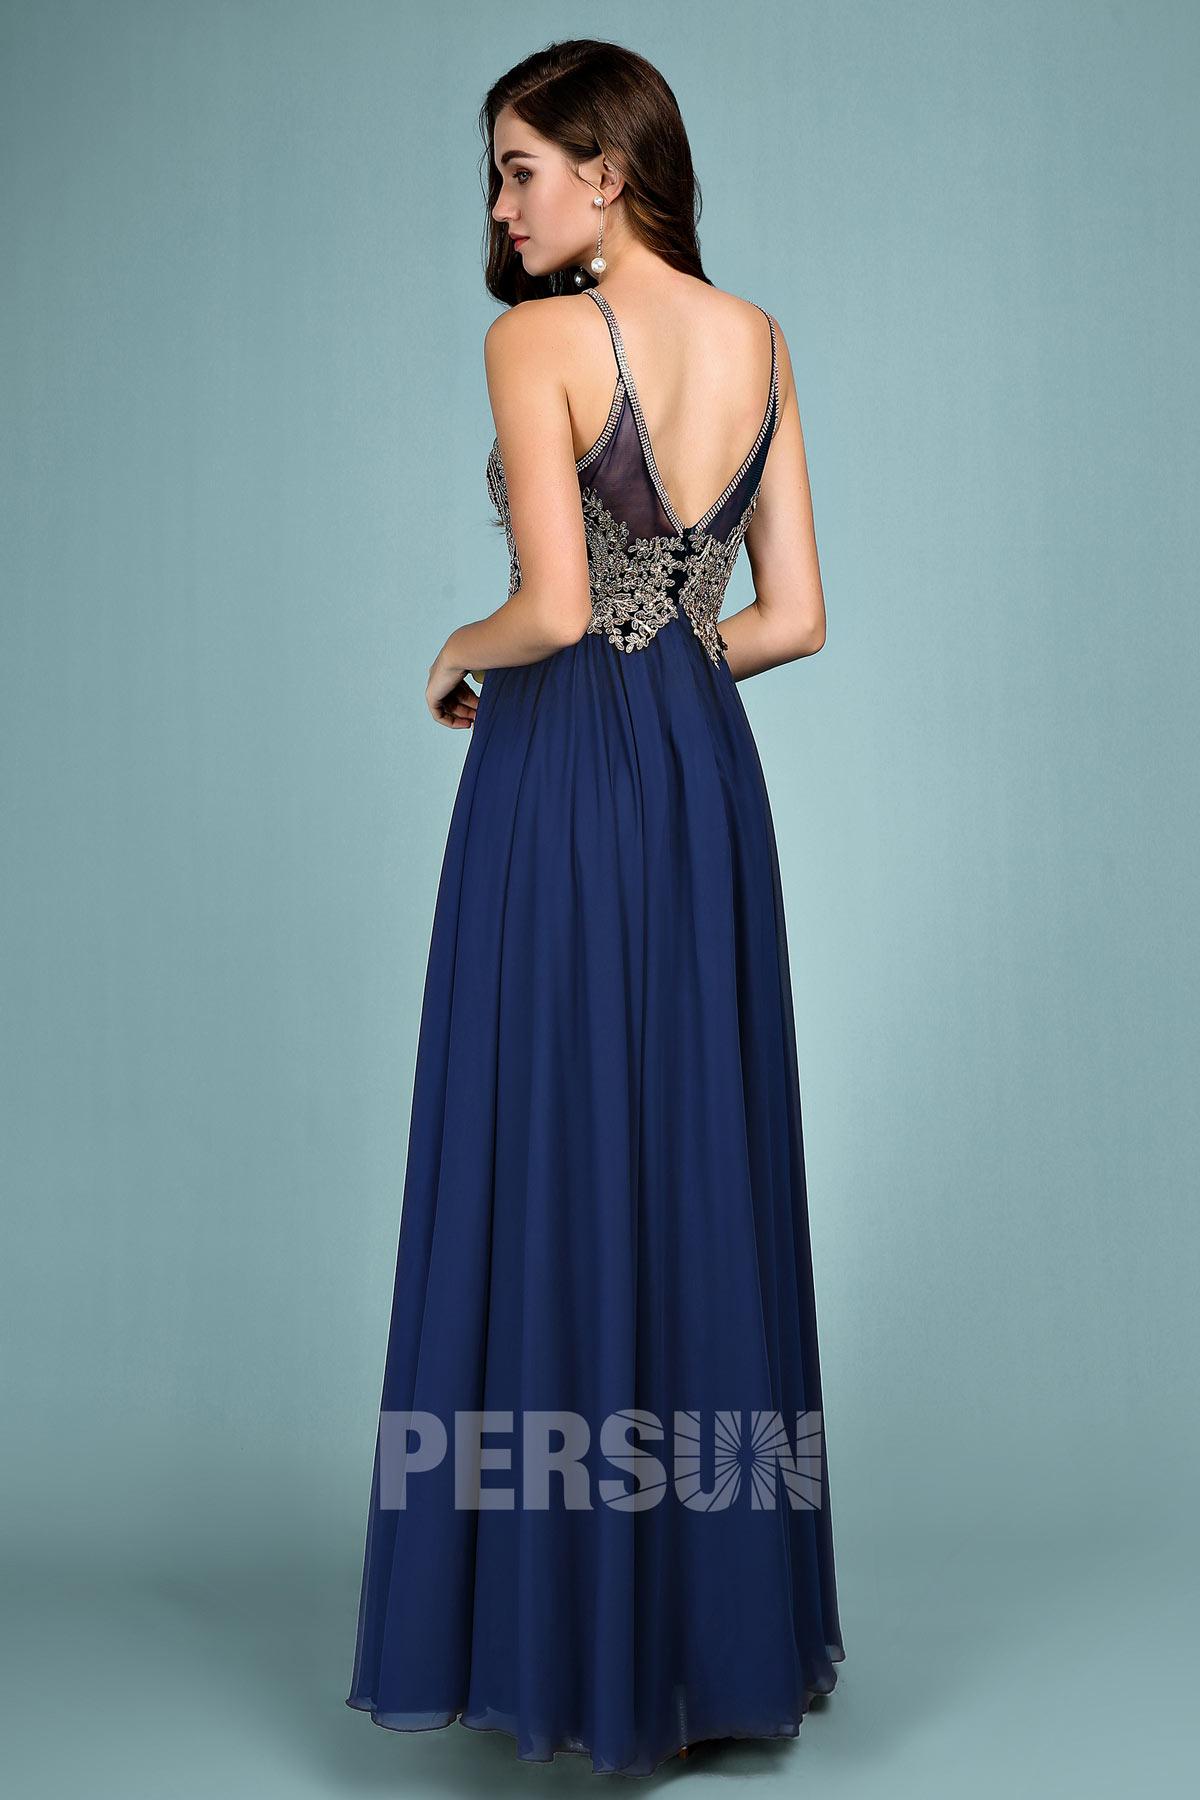 robe de soirée bleu haut appliqué de dentelle guipure dos échancré